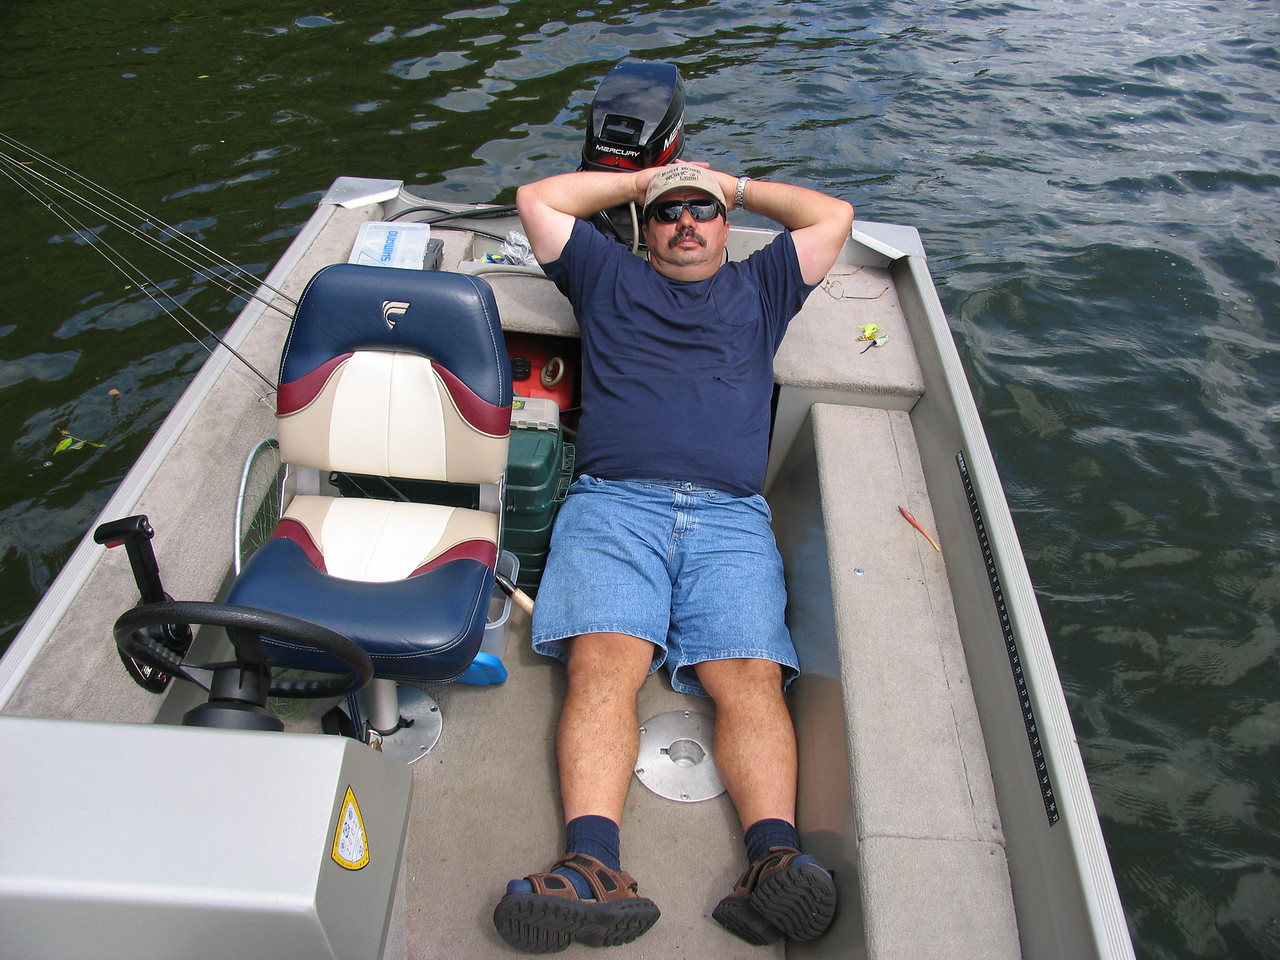 Dinu Iorga taking a break from fishing - Lake Nockamixon - August 2005